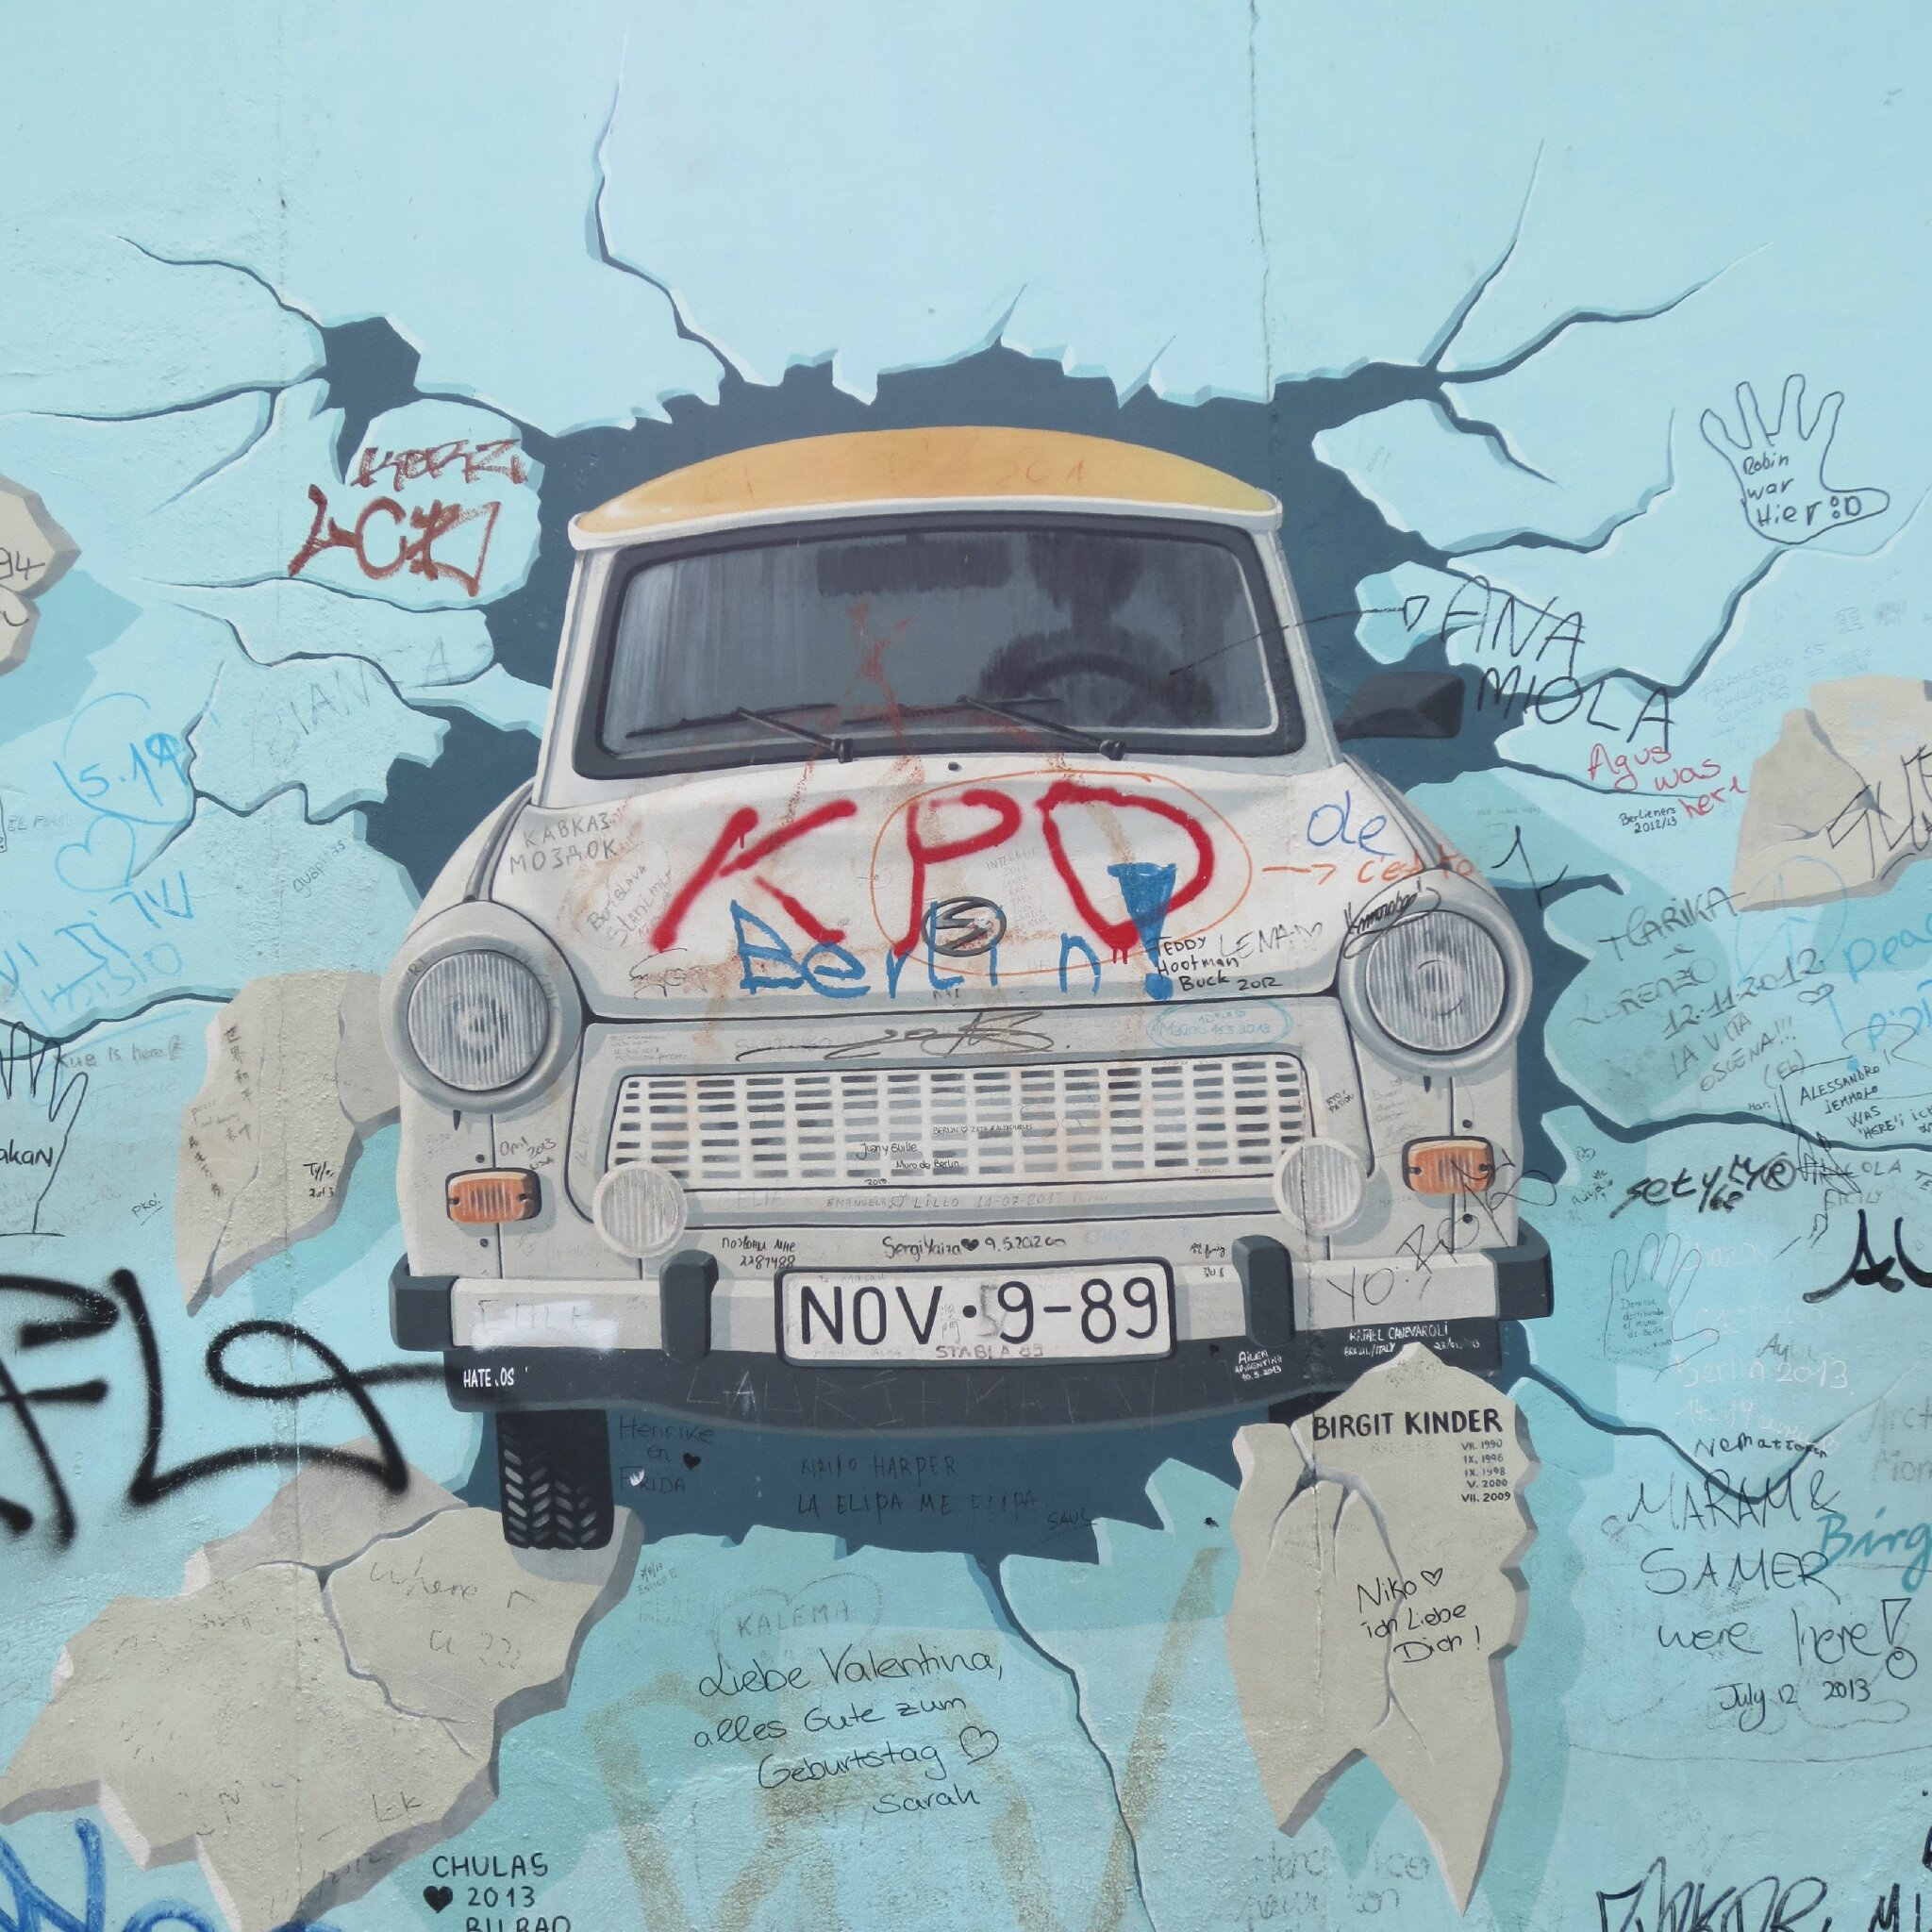 Berlin, the wall